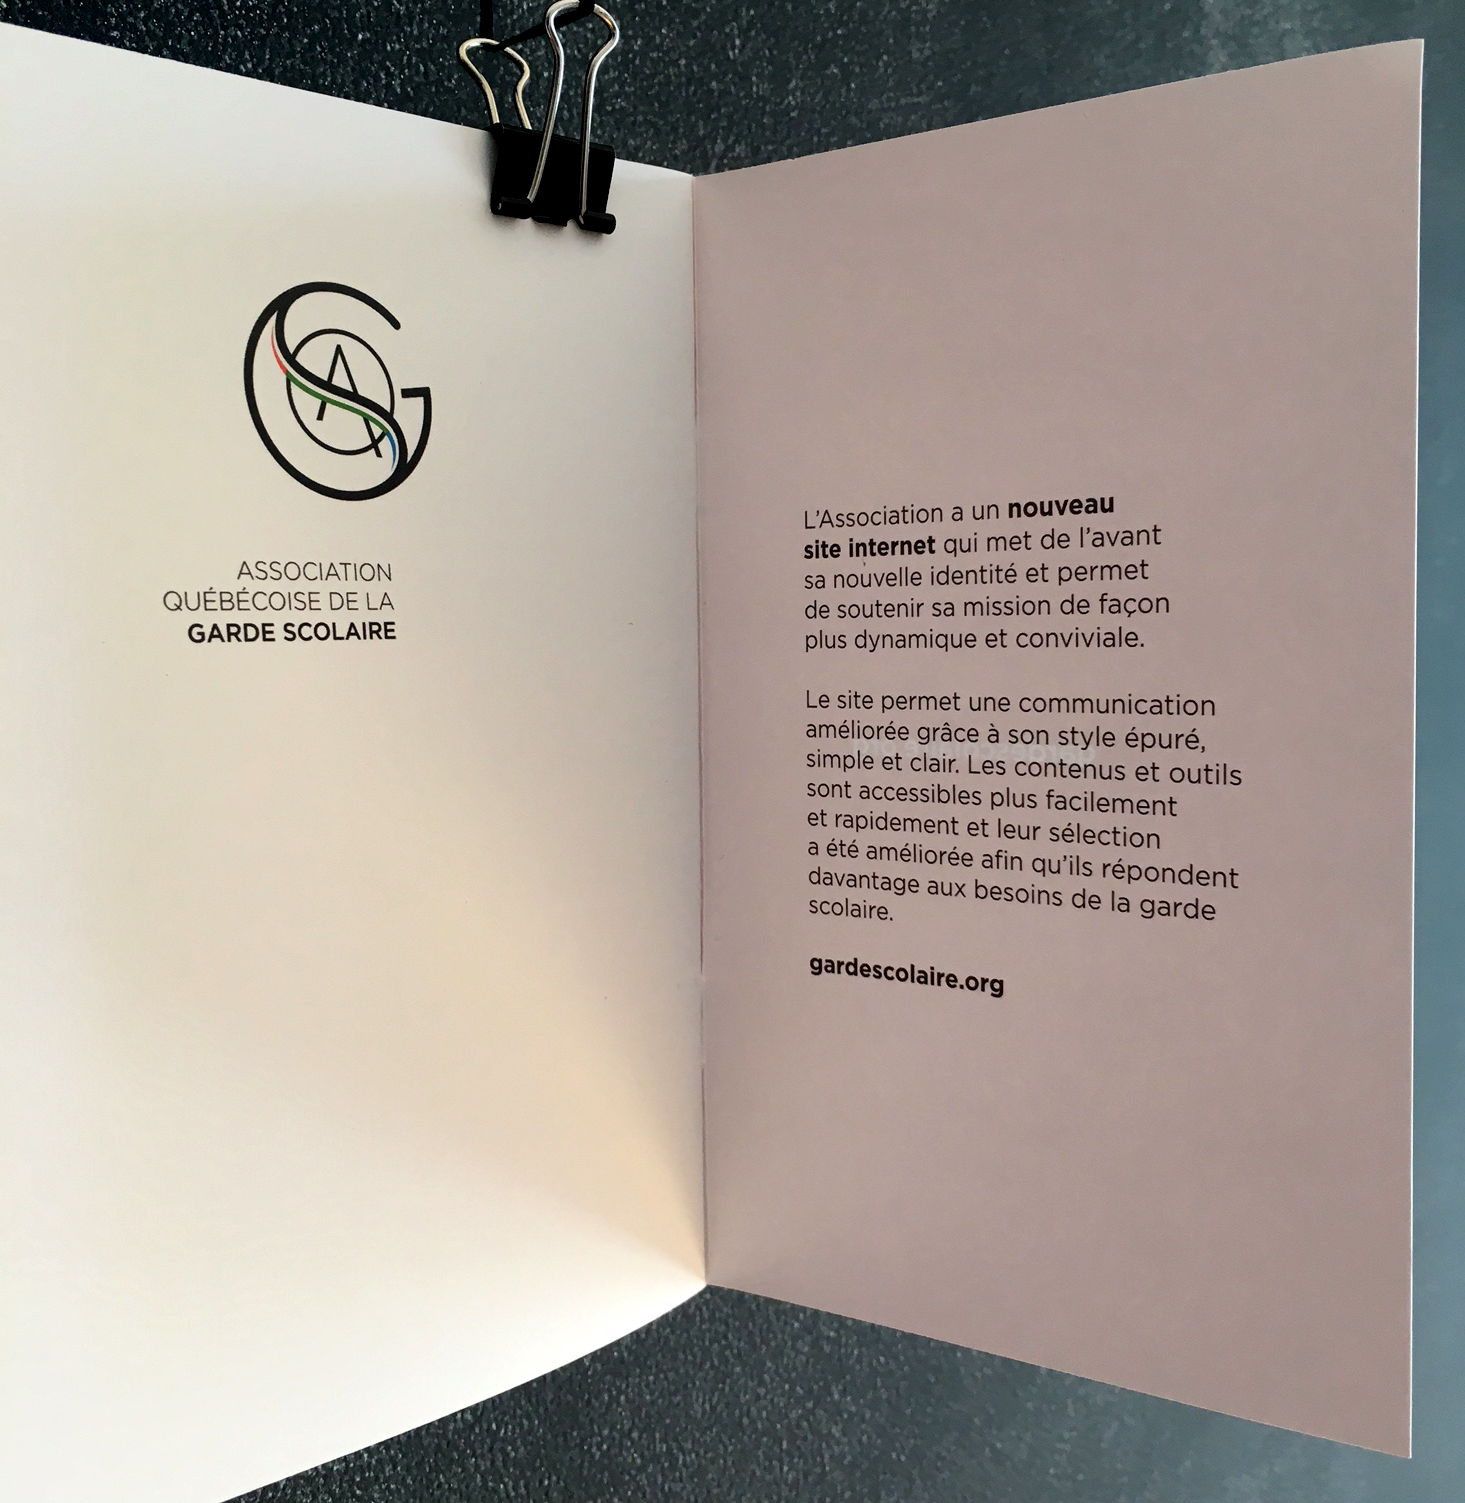 AQGS-brochure10.jpg